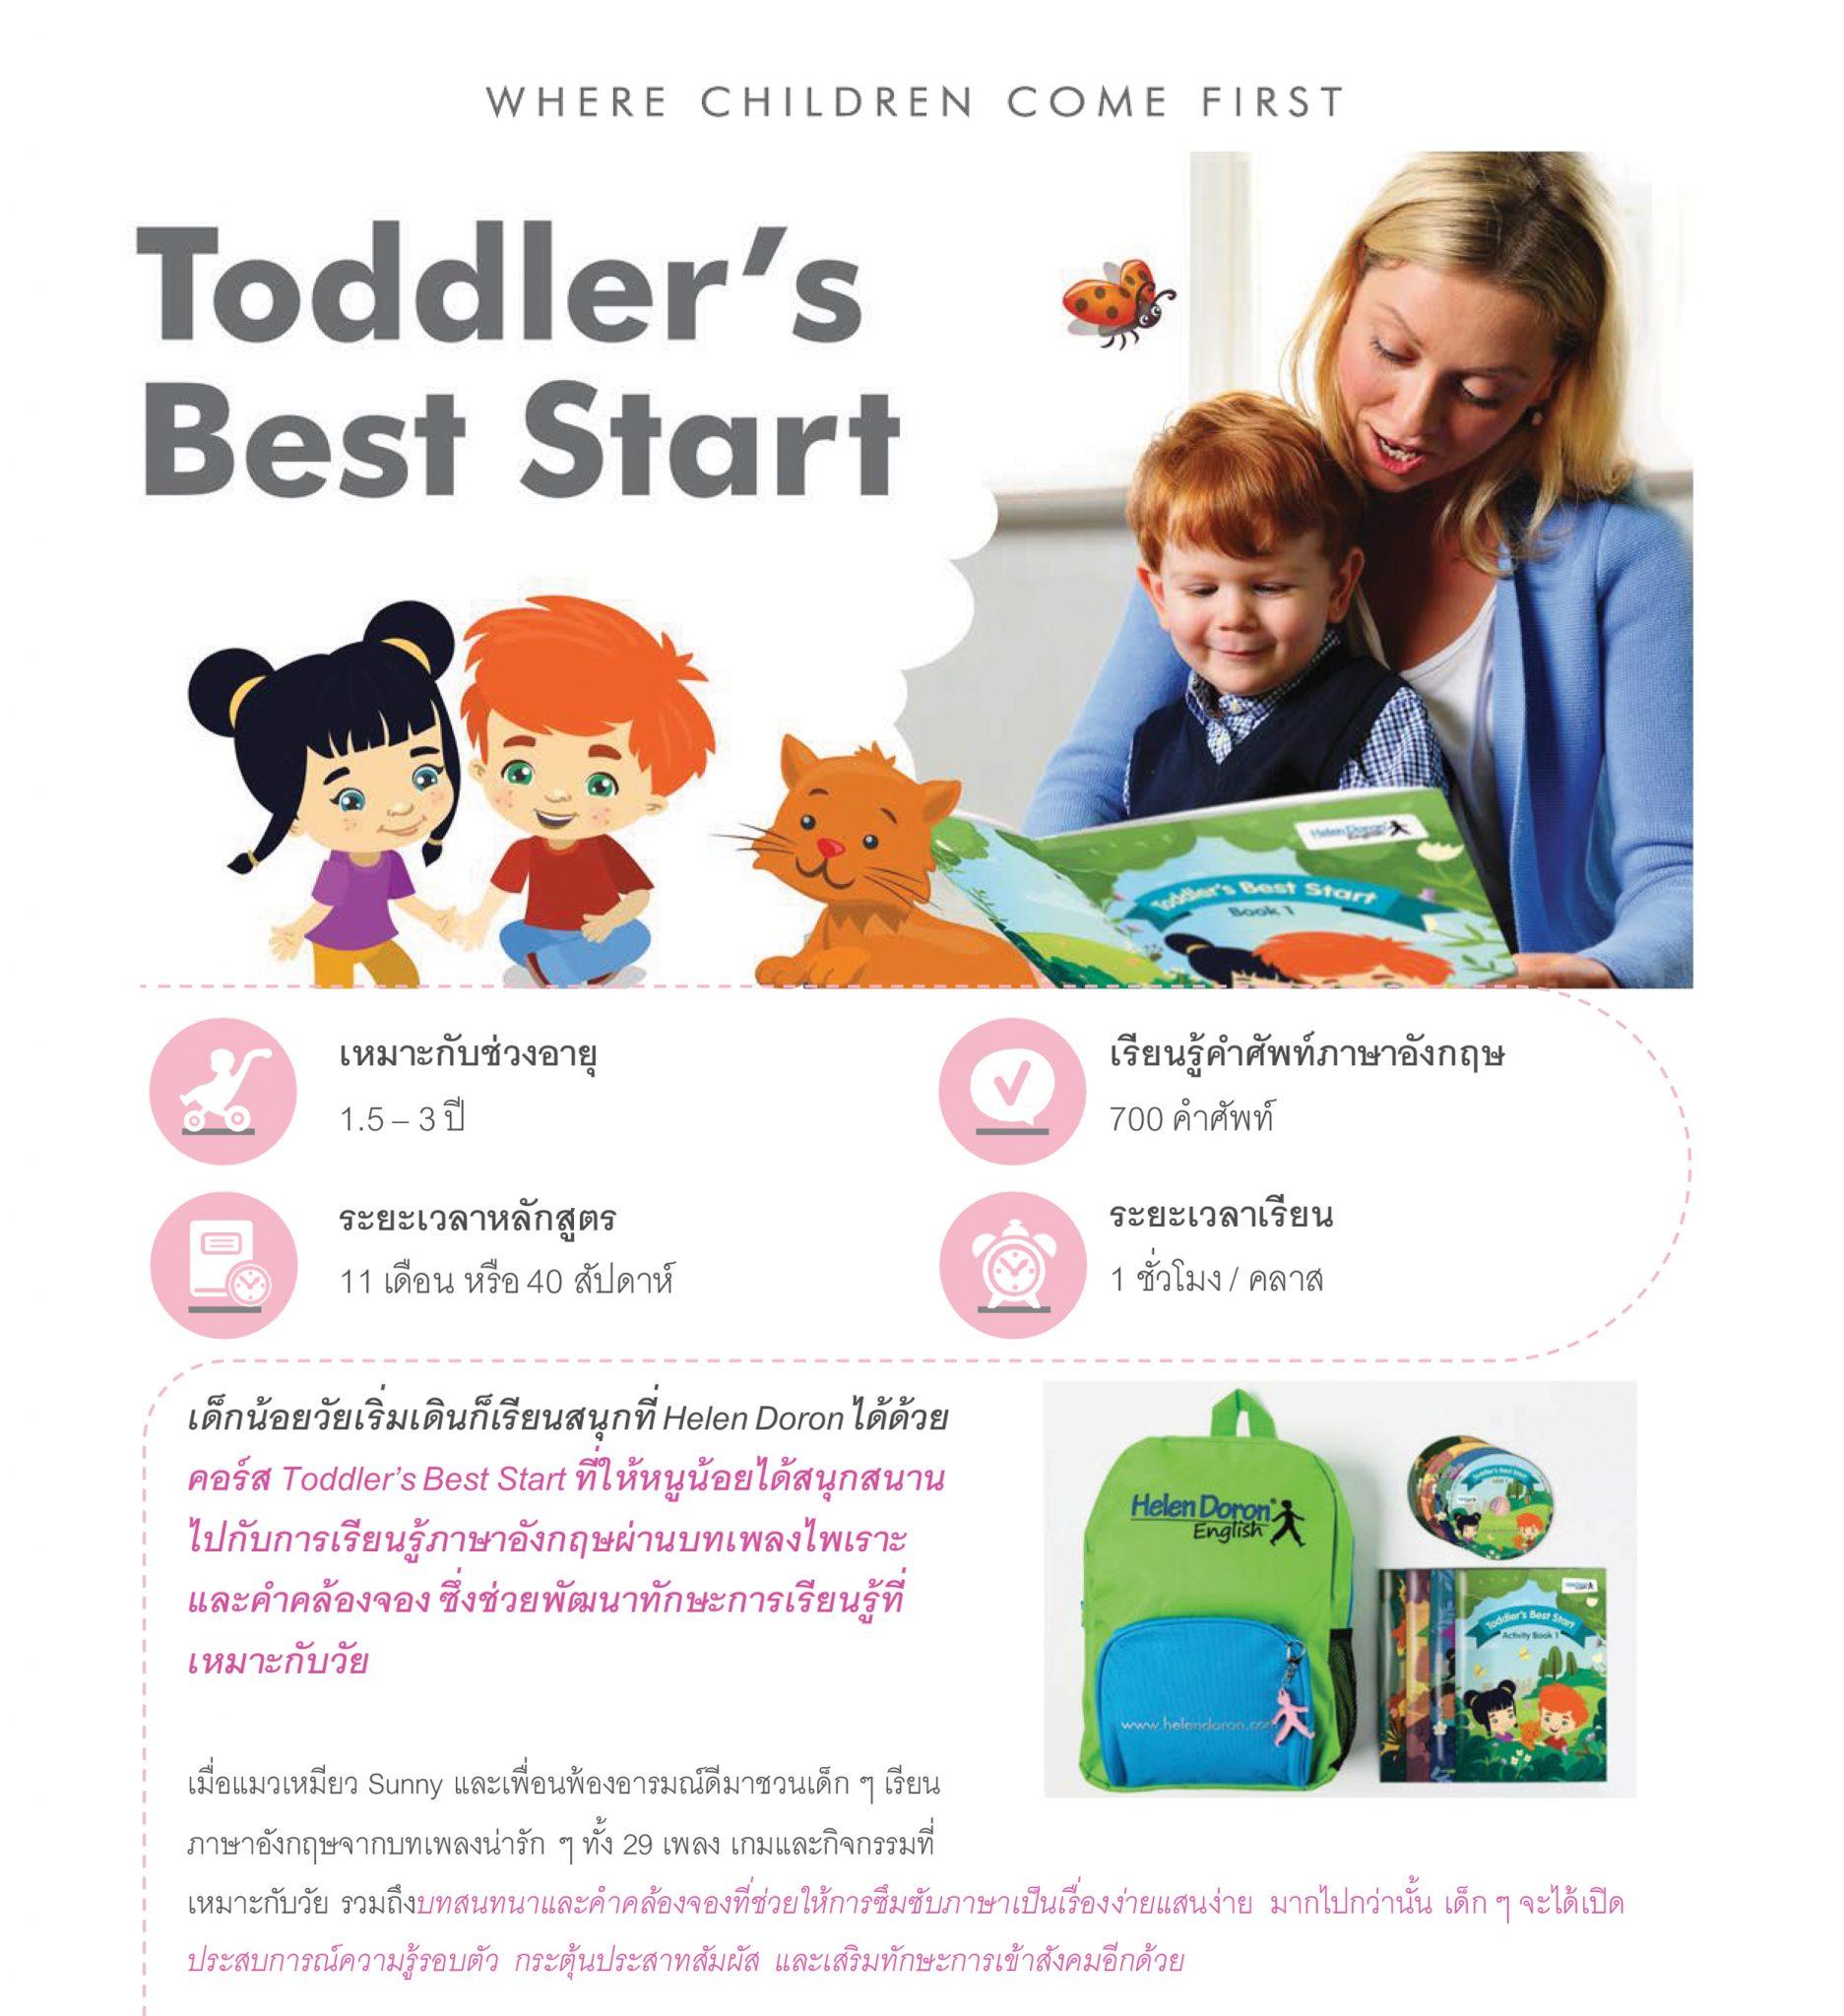 Download - Toddler's Best Start